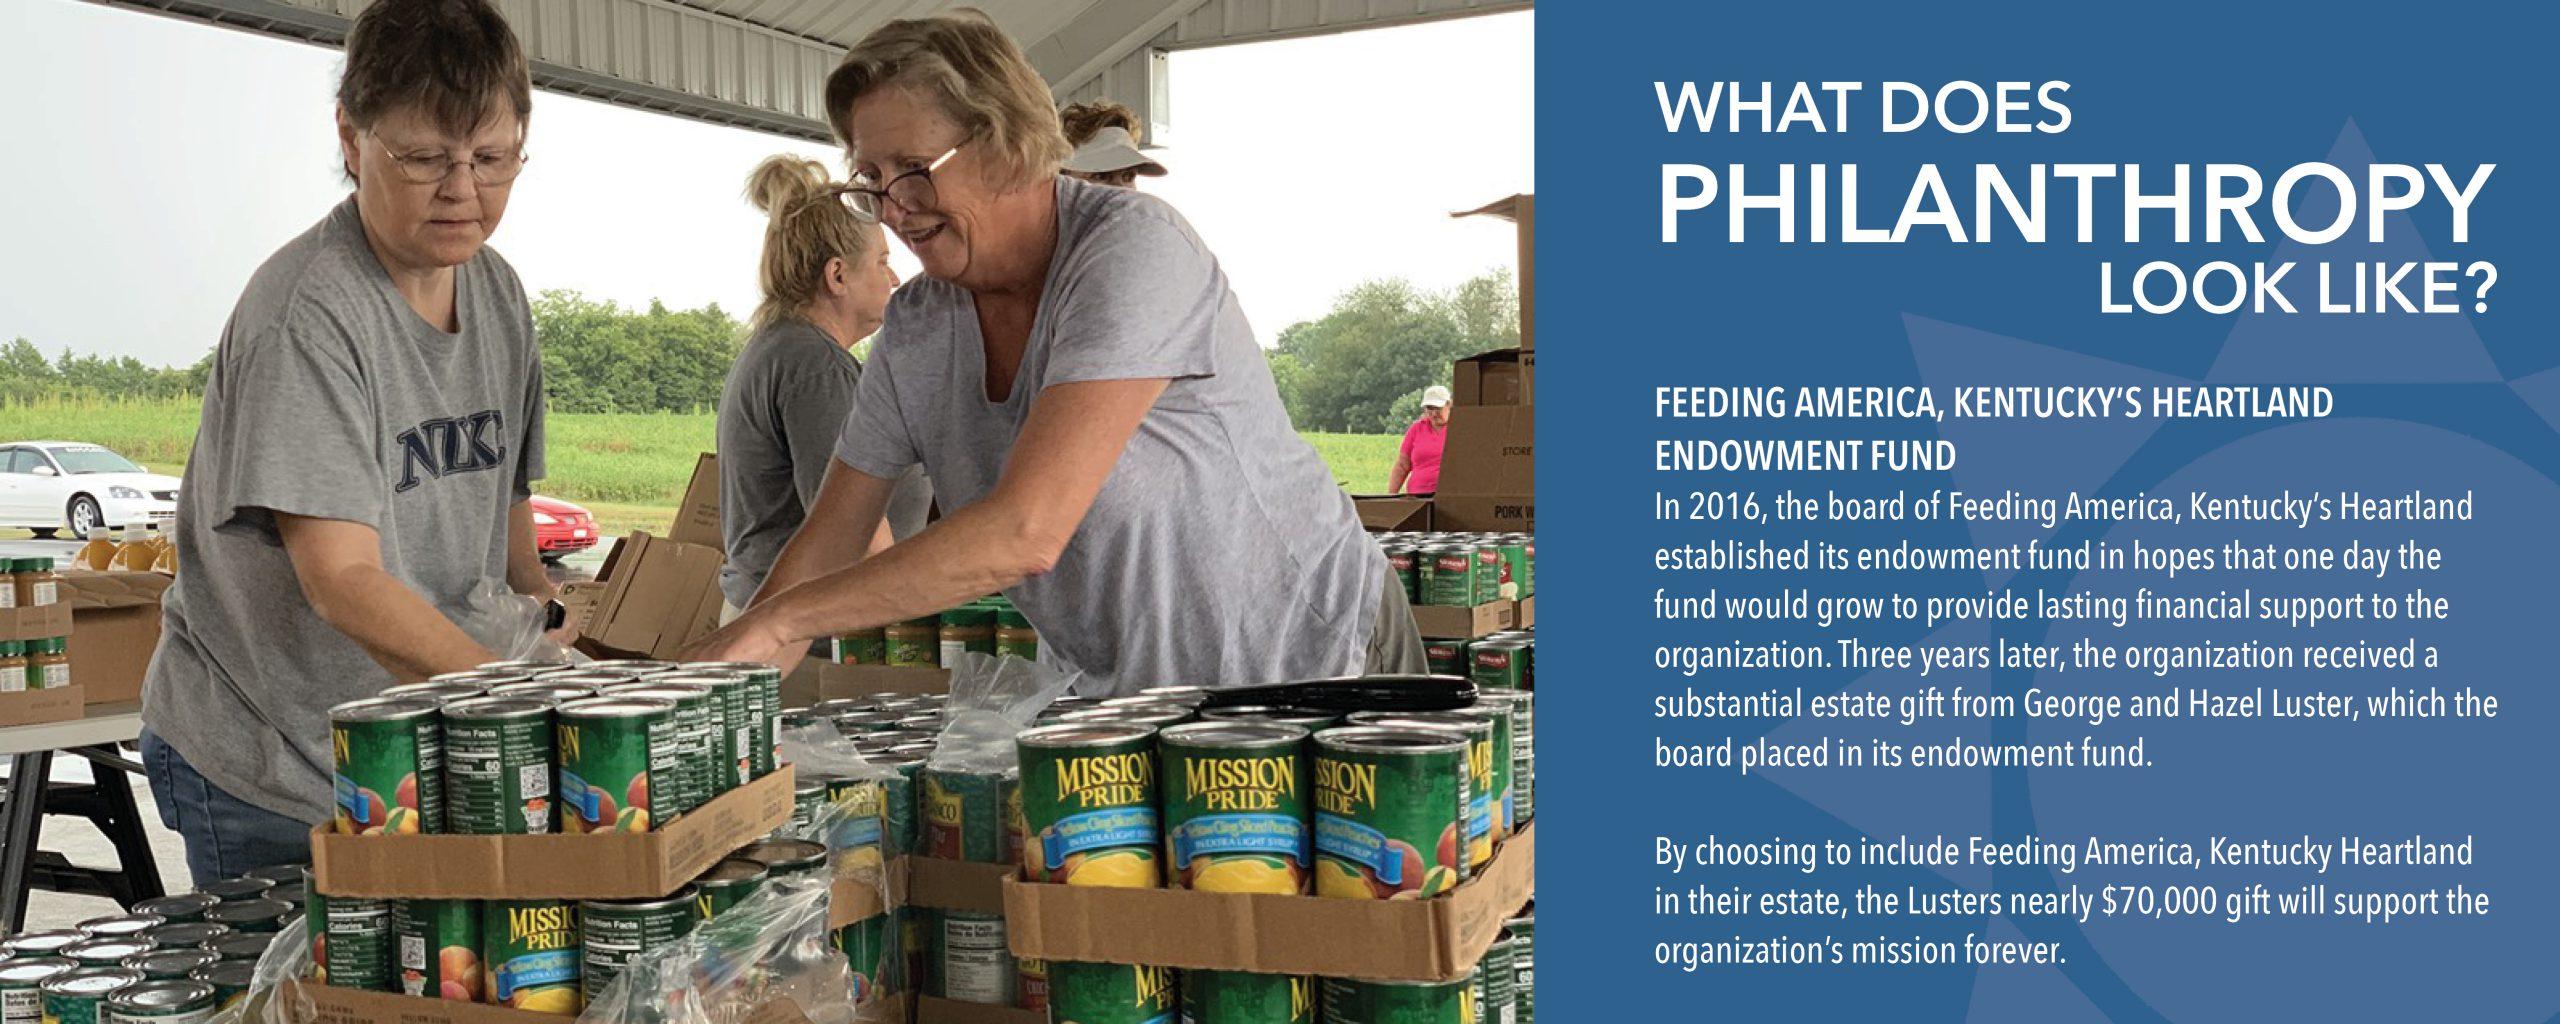 Feeding America Endowment